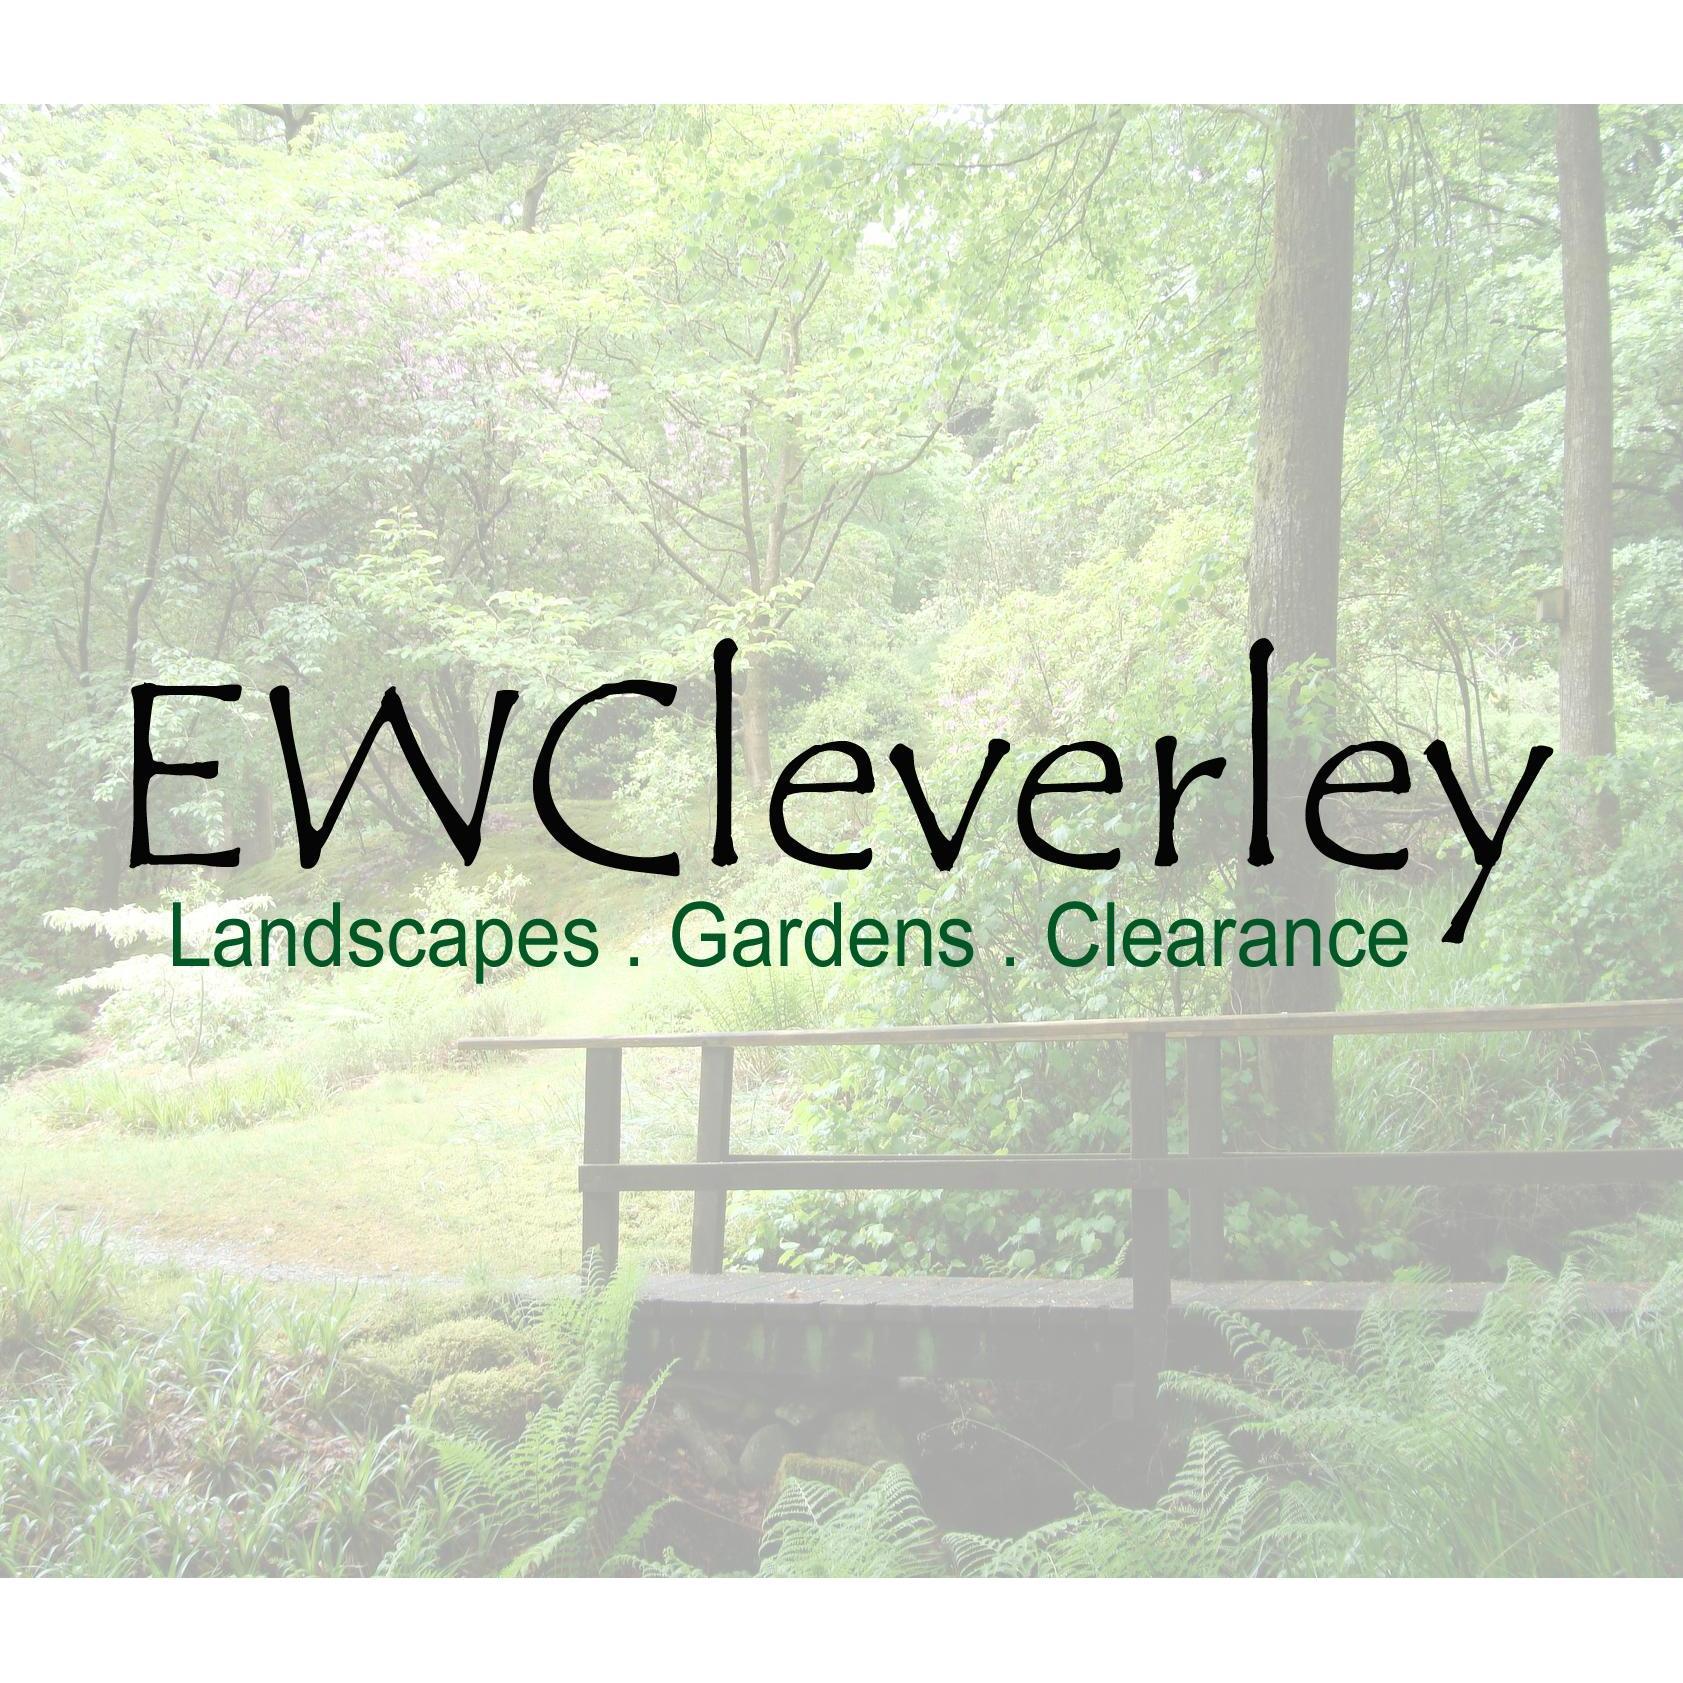 EWCleverley - St. Austell, Cornwall PL25 4NE - 07527 914257   ShowMeLocal.com